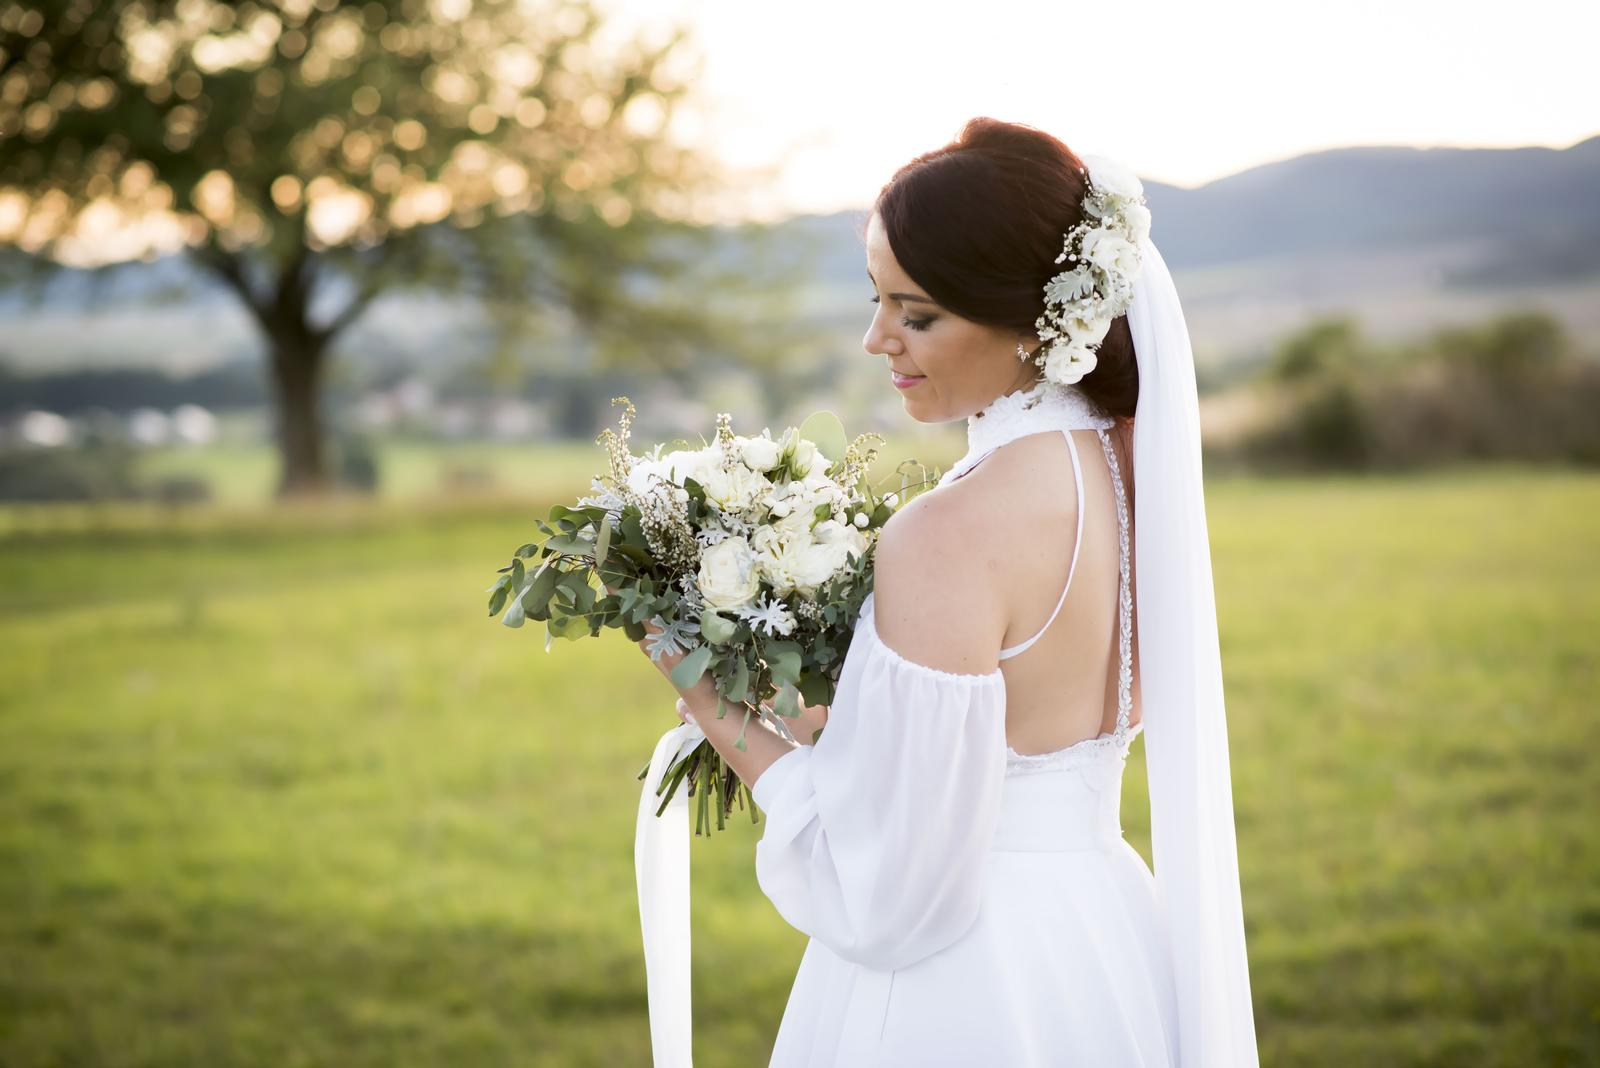 Svadobné šaty s vlečkou 2019 - Obrázok č. 4